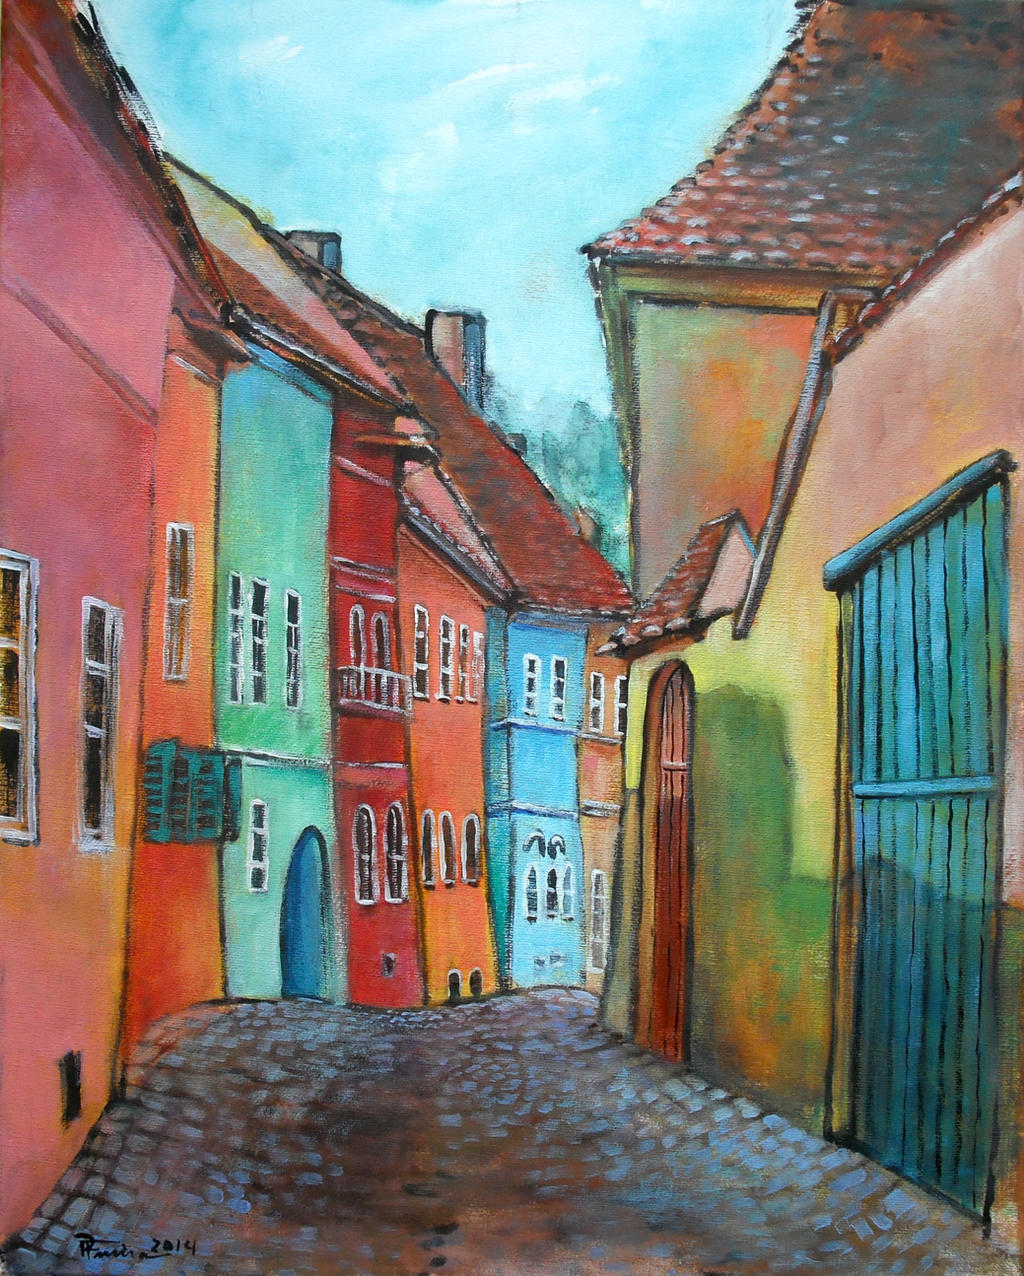 Village (acrylic) by Boias